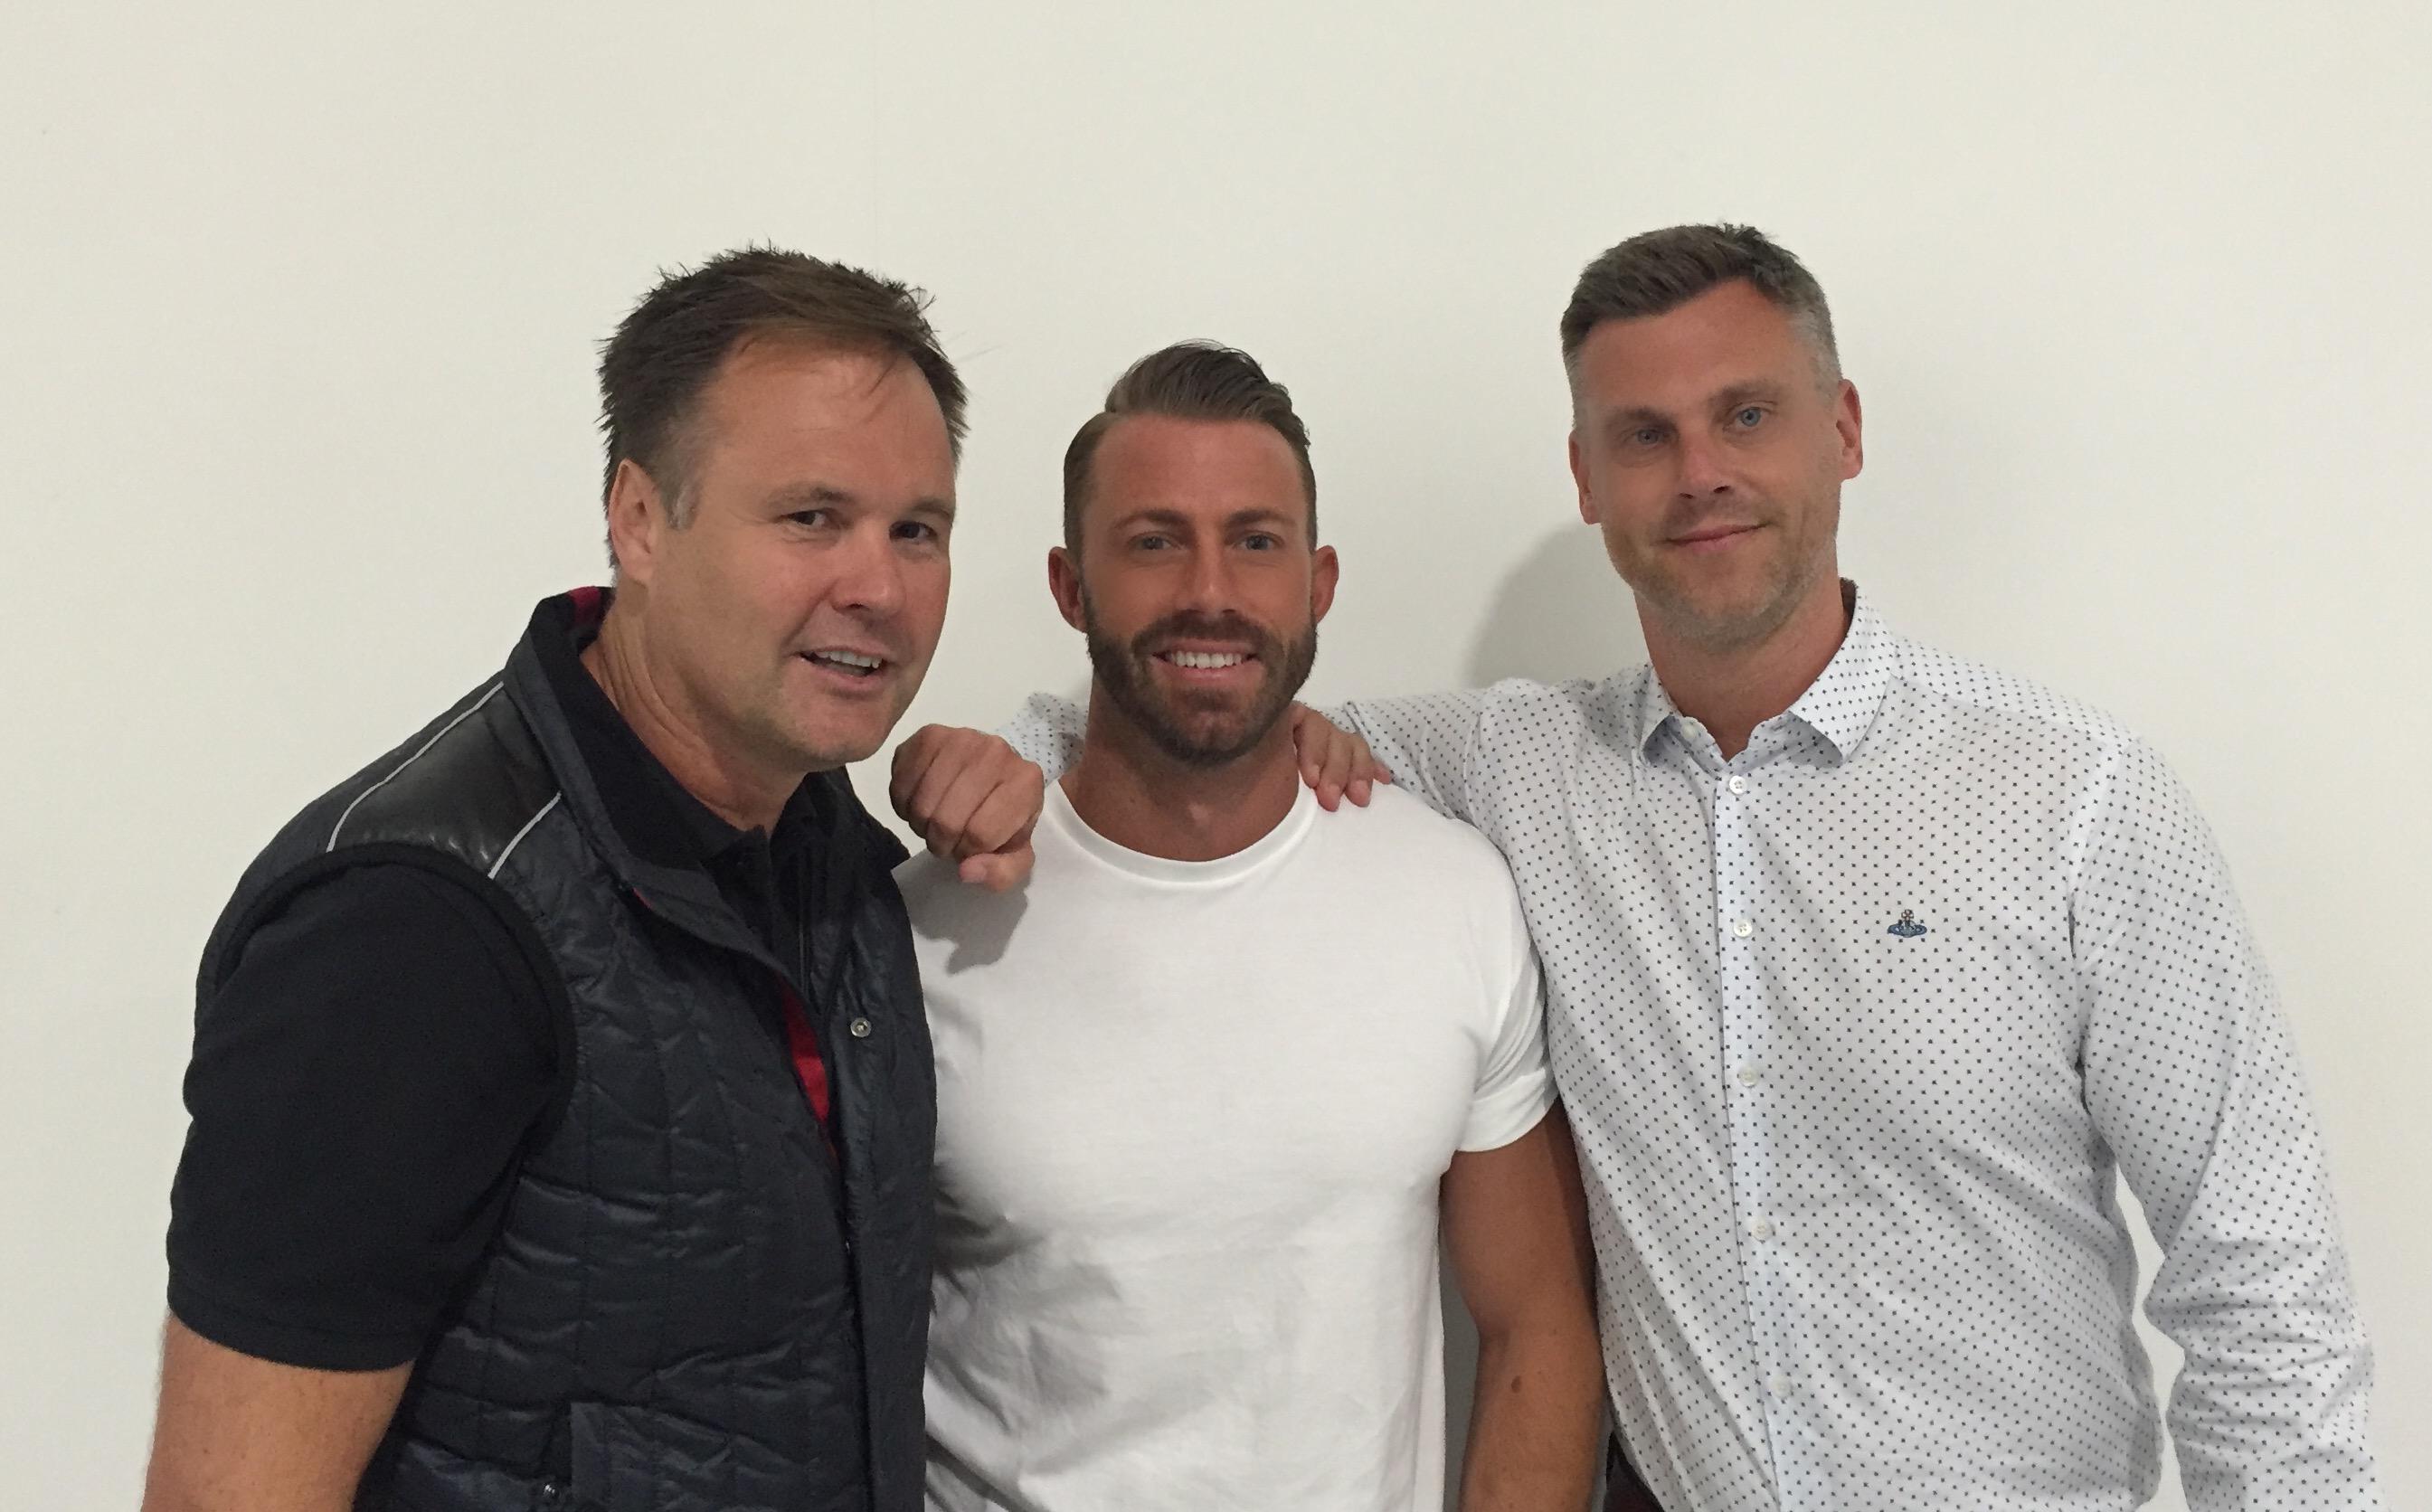 Mark Holland, Pete Harpam and David Nicholson